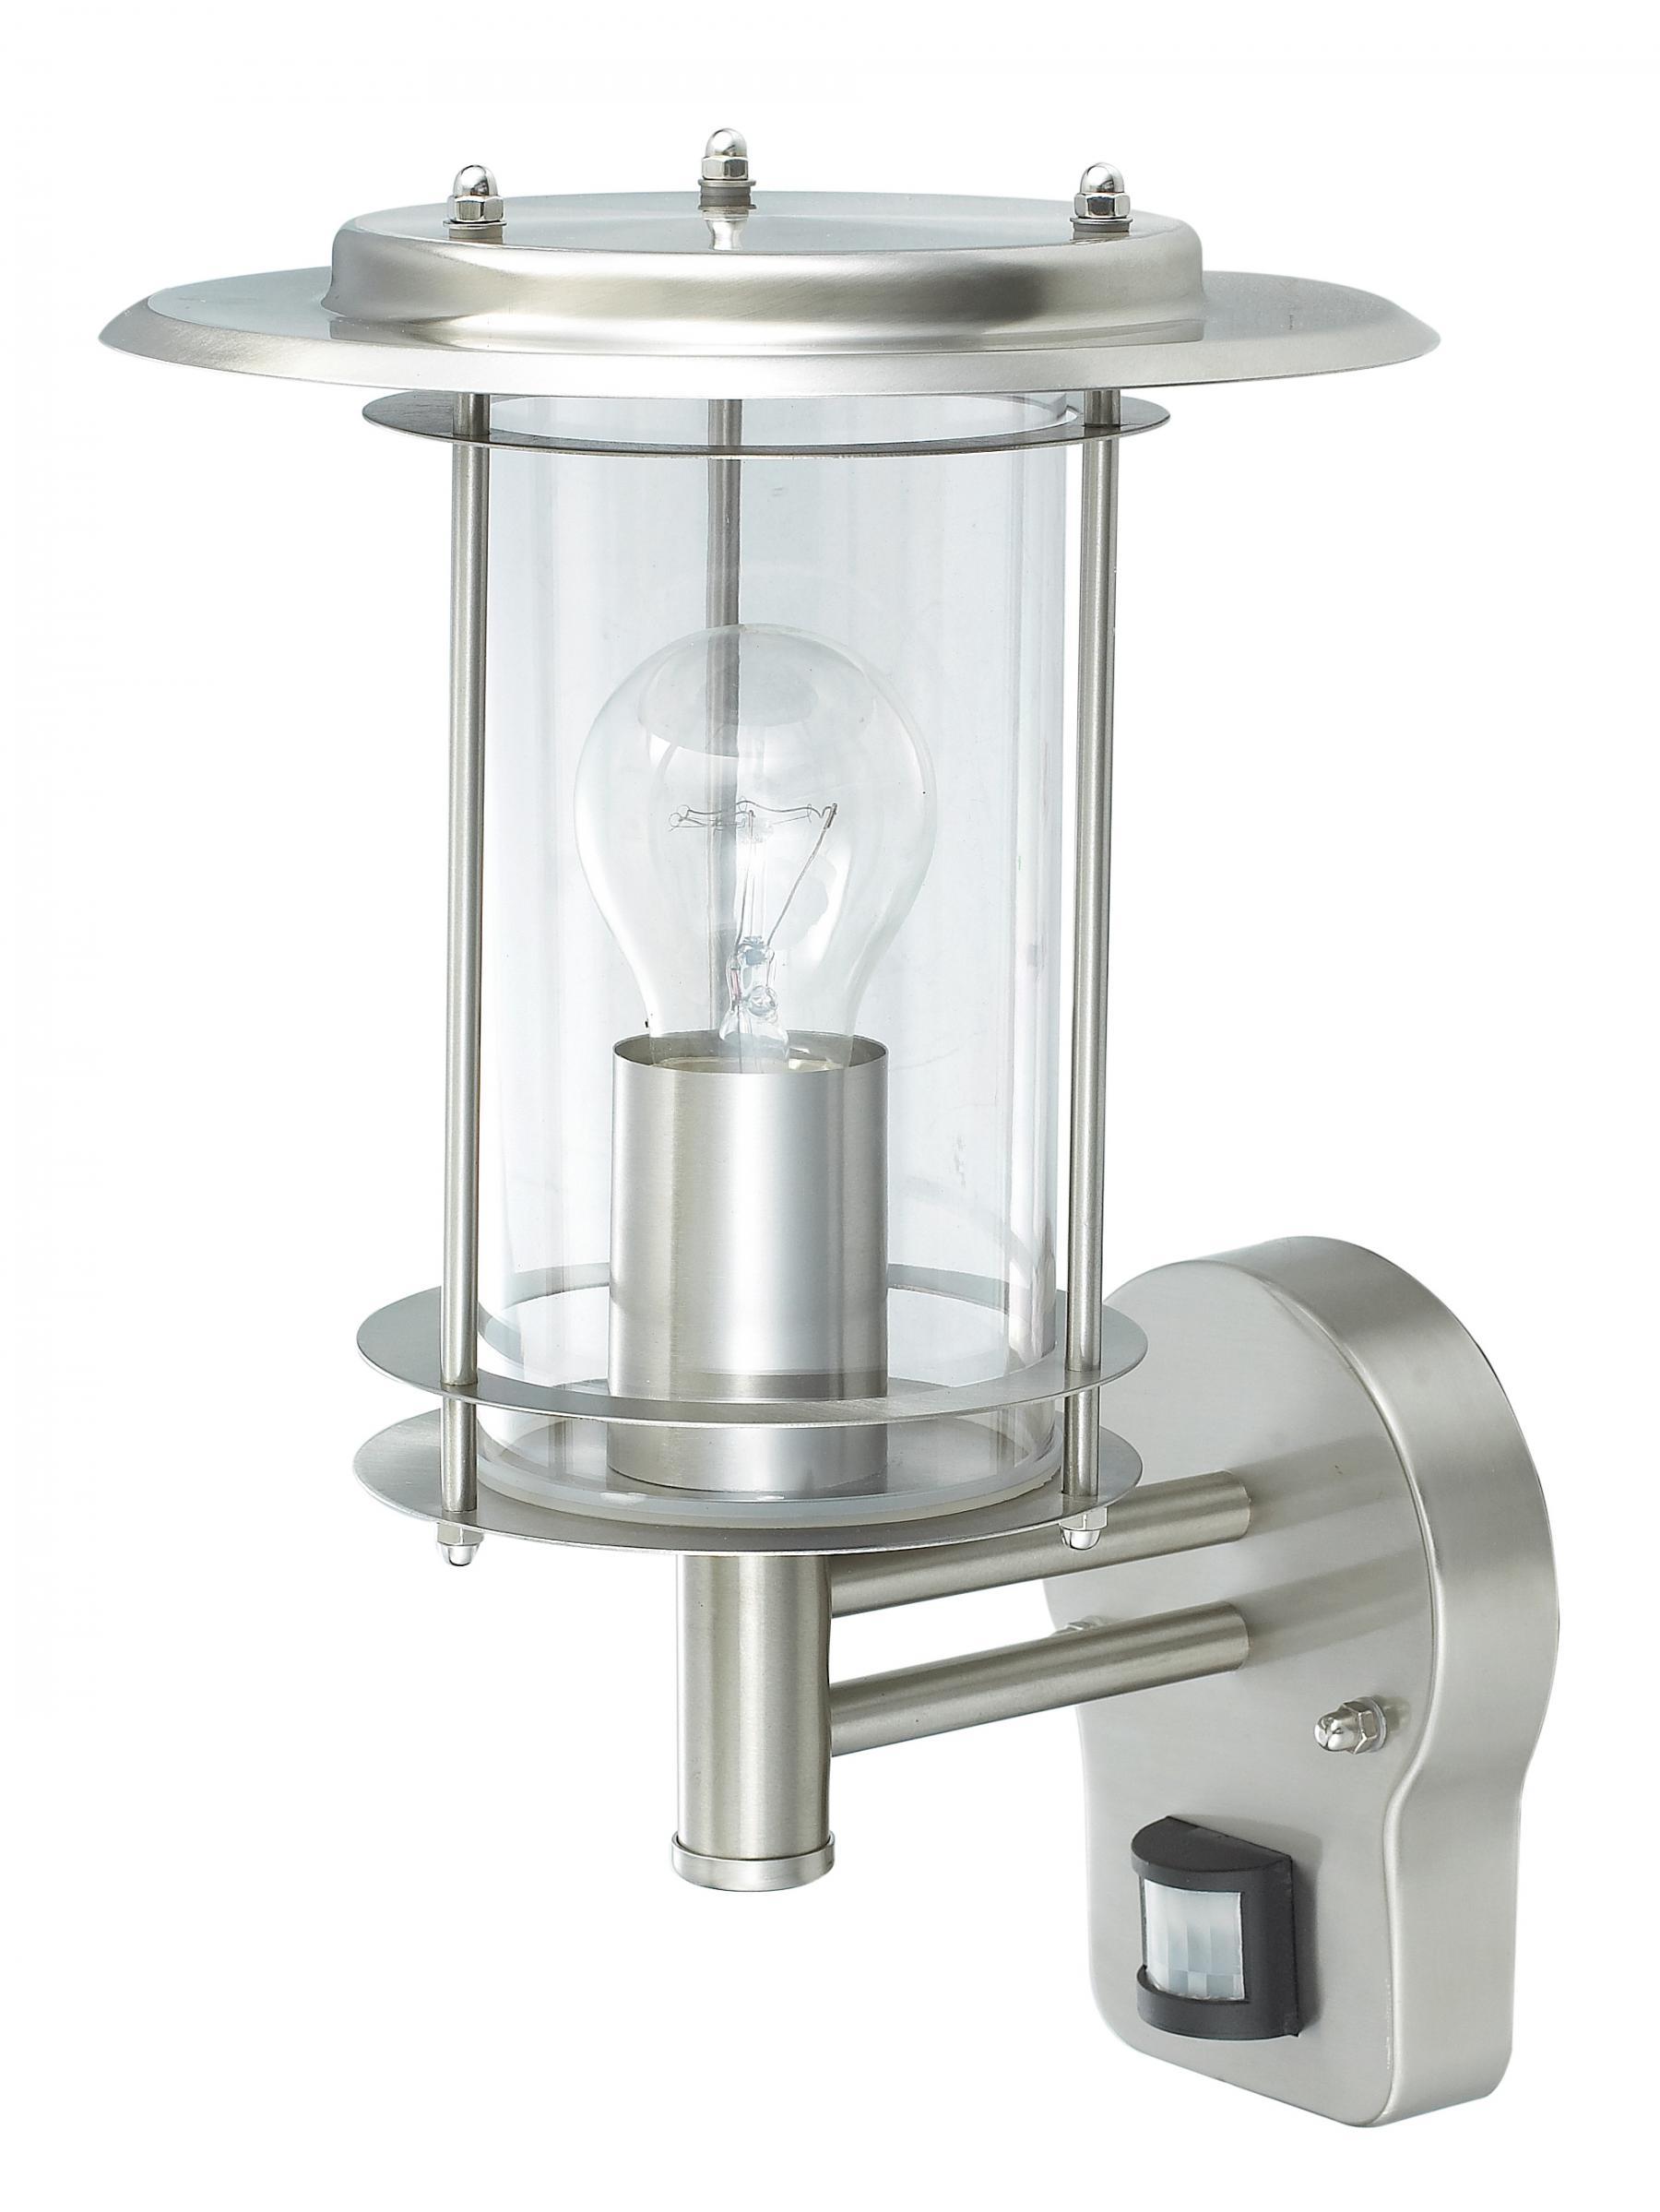 wandlampe au enleuchte au enlampe neptun bewegungsmelder edelstahl ip44 led geeignet wandleuchte. Black Bedroom Furniture Sets. Home Design Ideas